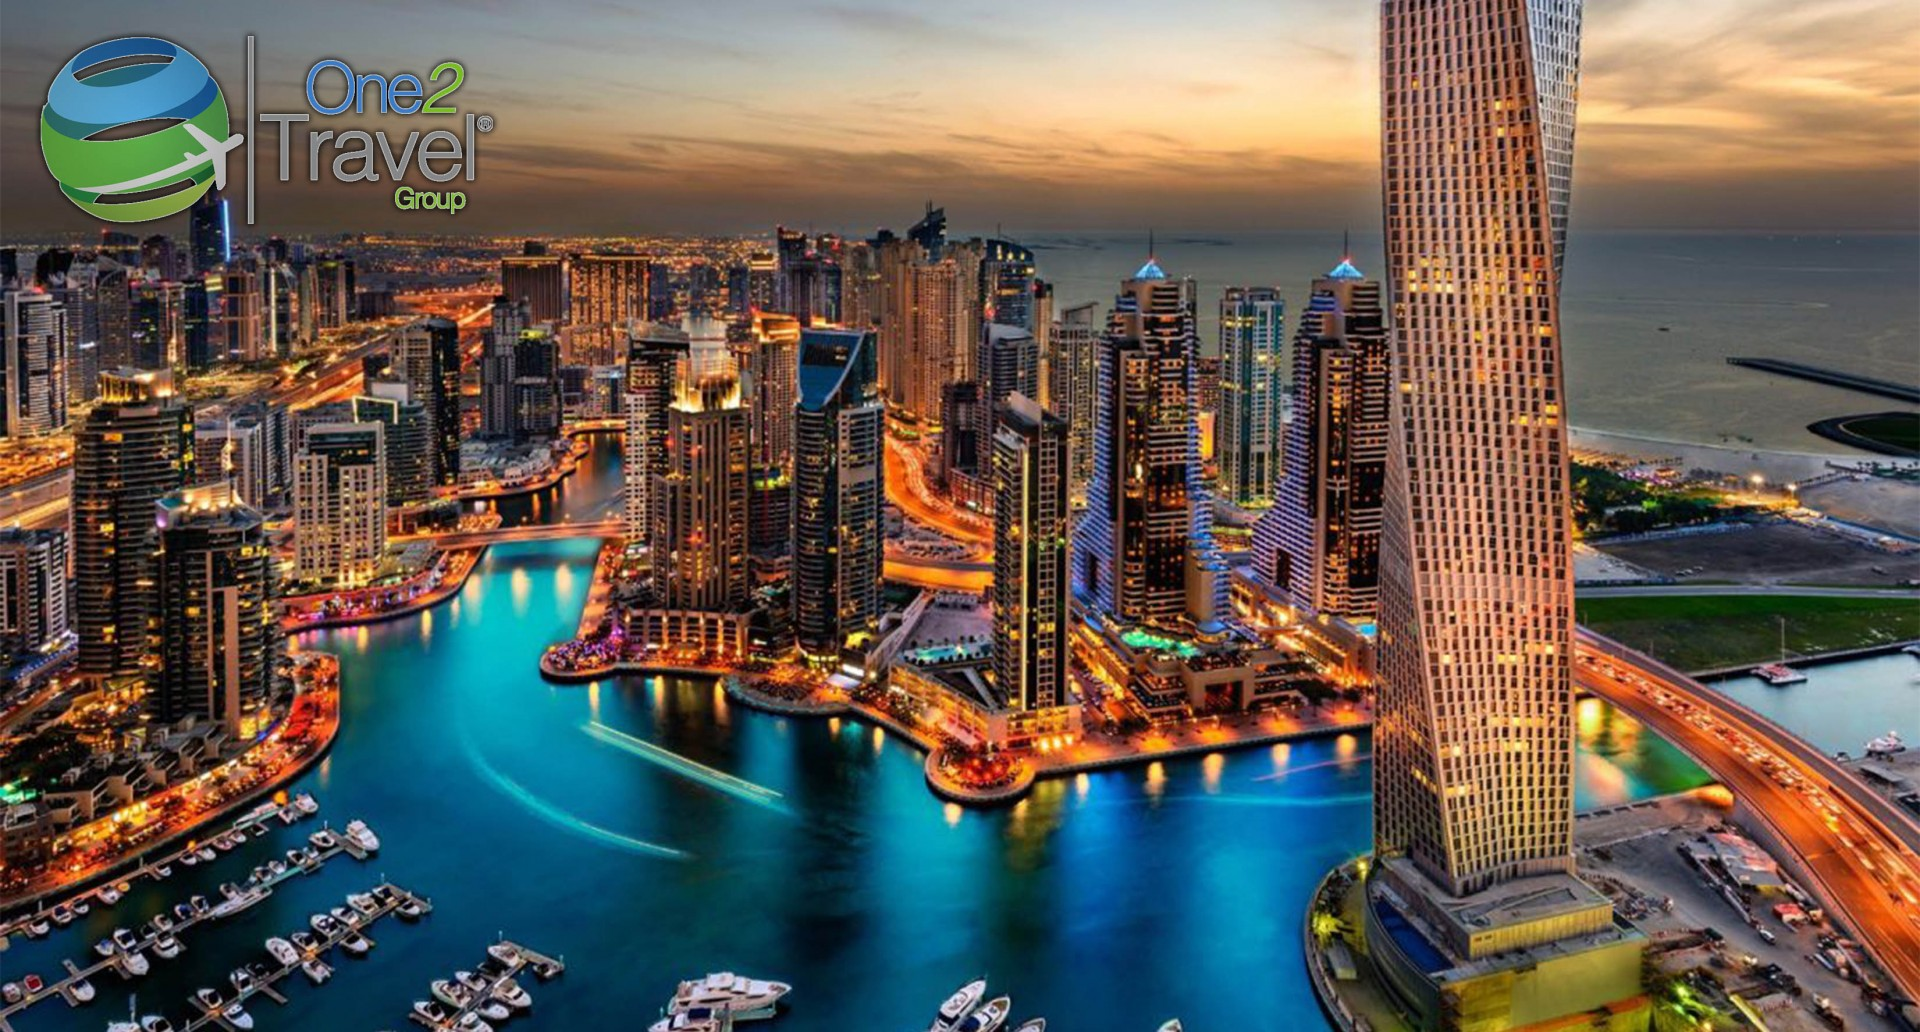 Directrices para Turistas que Viajan a Dubai